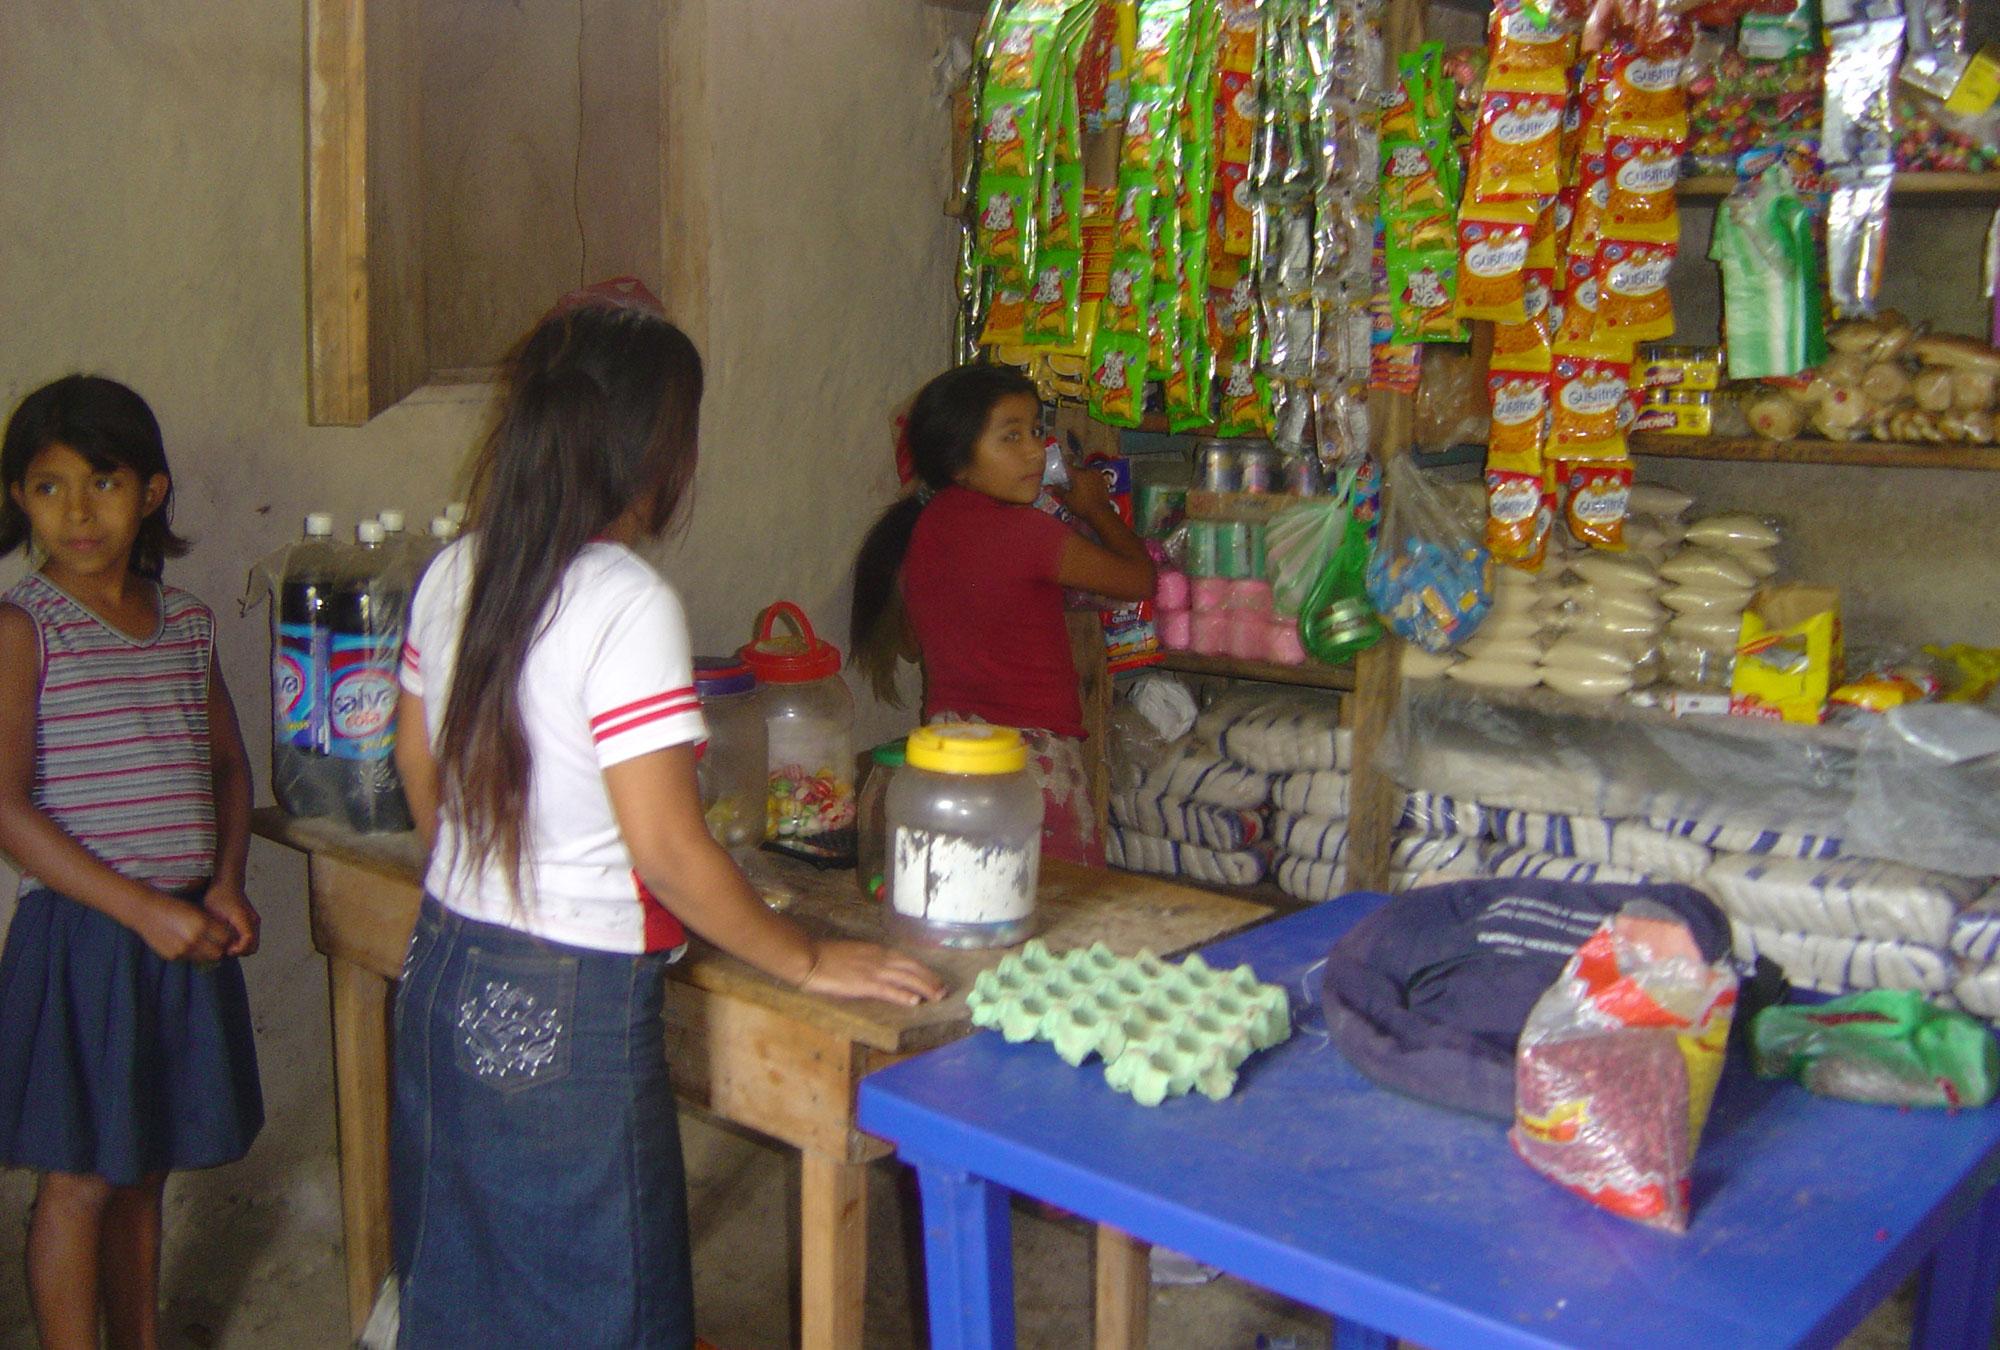 Children working in a store